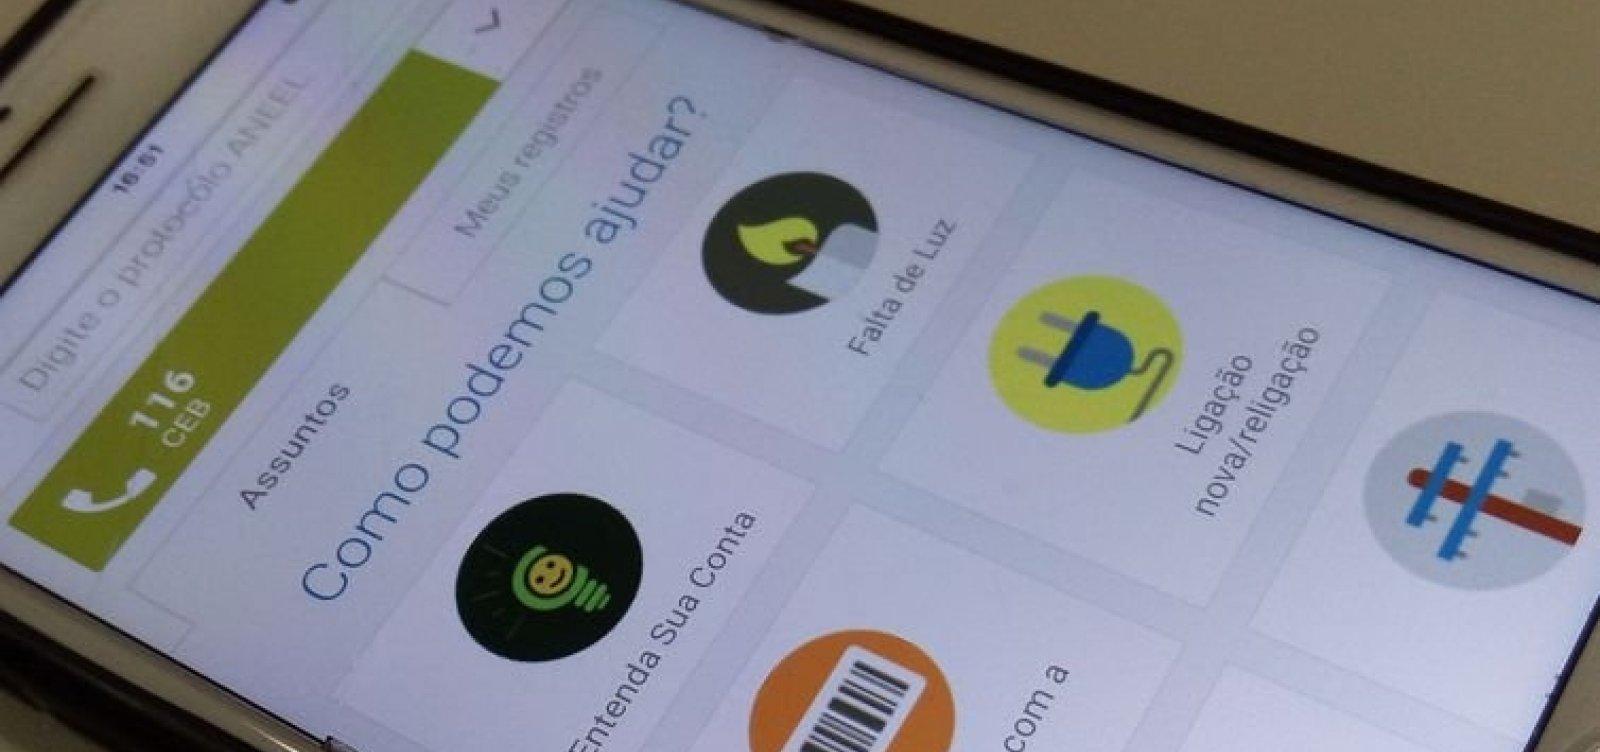 [Aneel lança aplicativo para ajudar consumidor a entender conta de luz ]